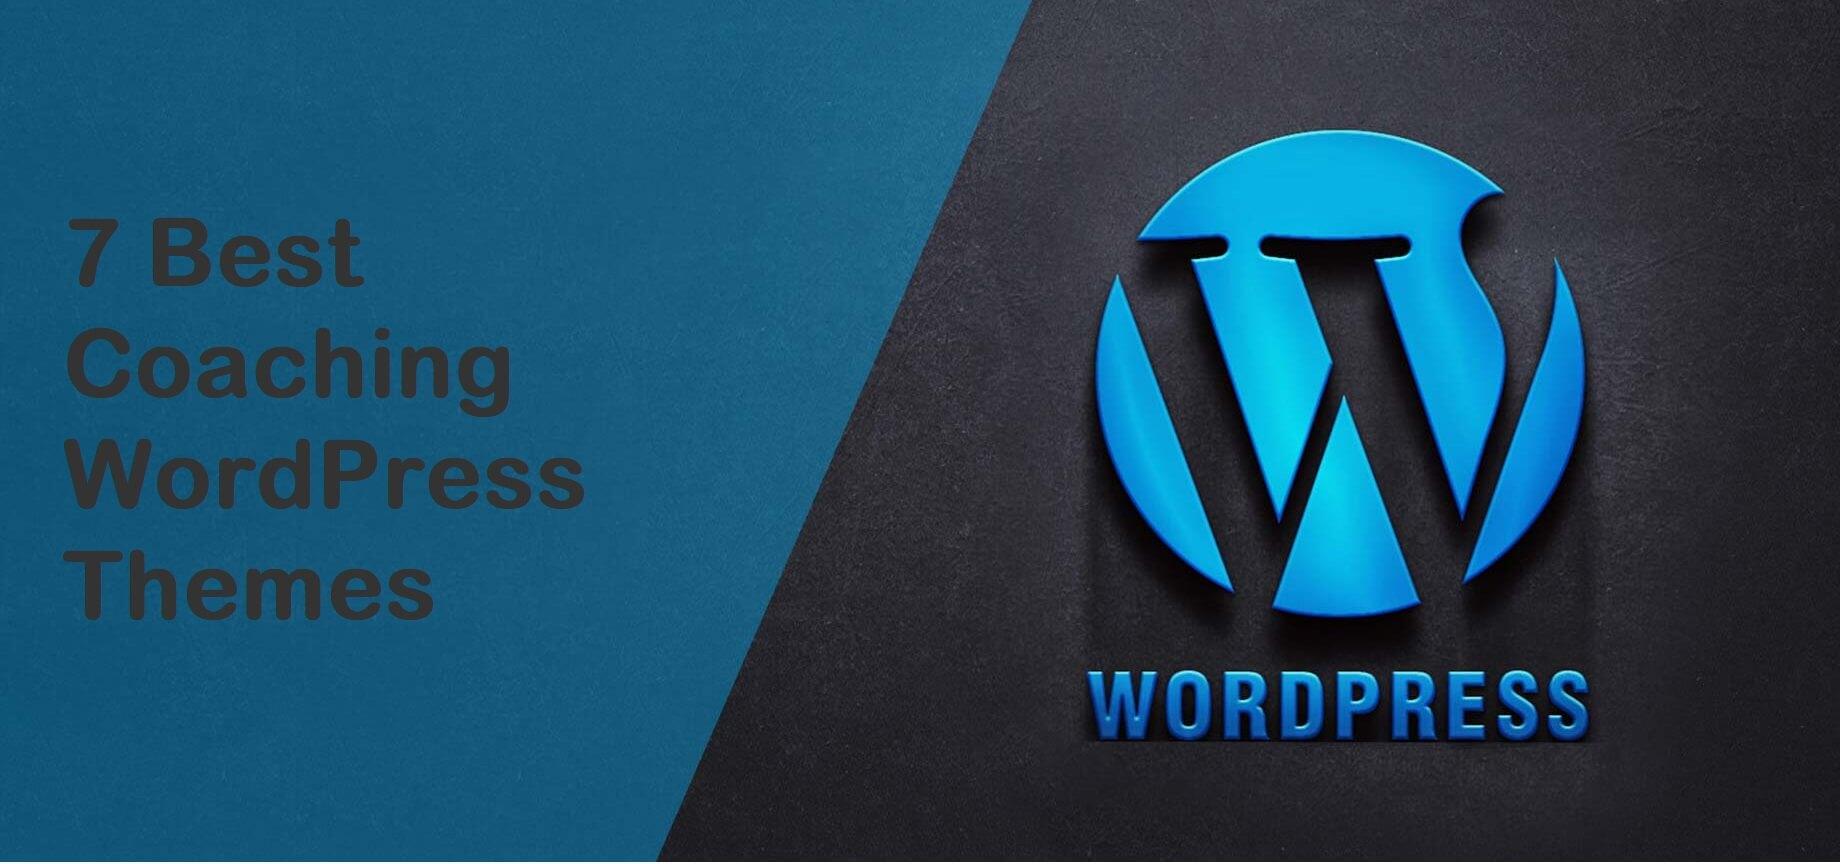 7 Best Coaching WordPress Themes